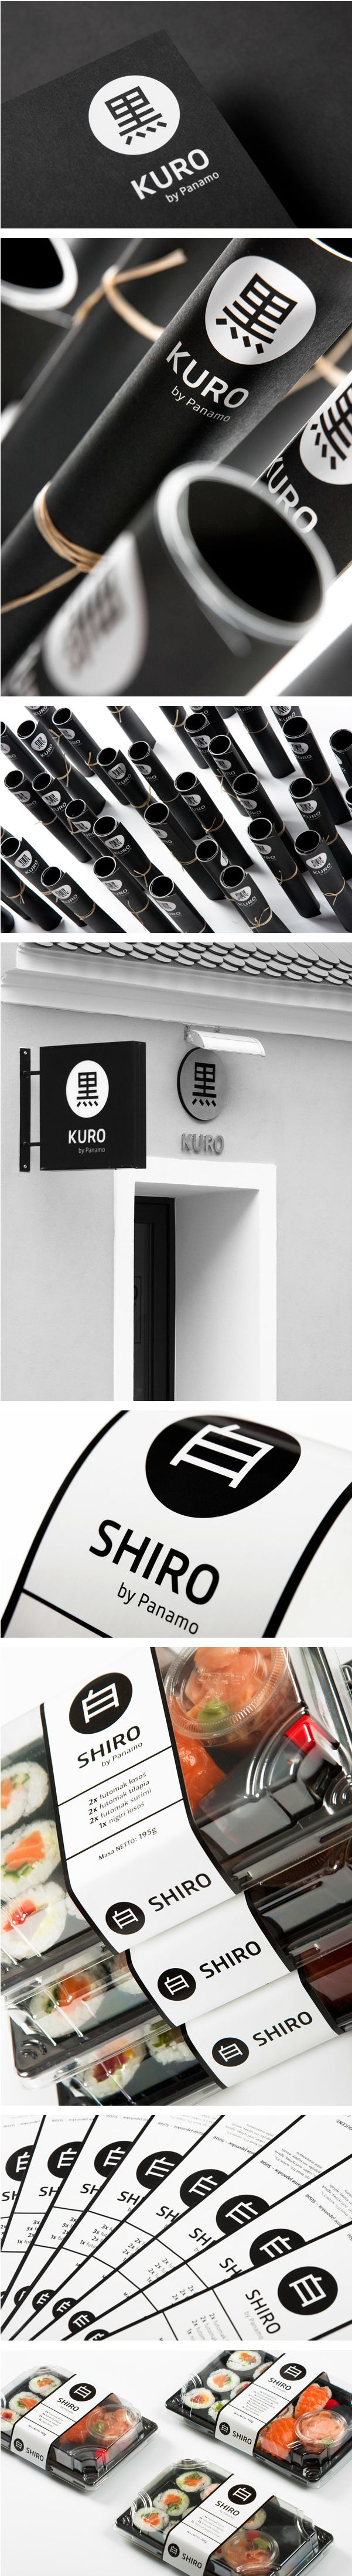 Kuro & Shiro on Behance. It's sushi for lunch #identity #packaging #branding PD